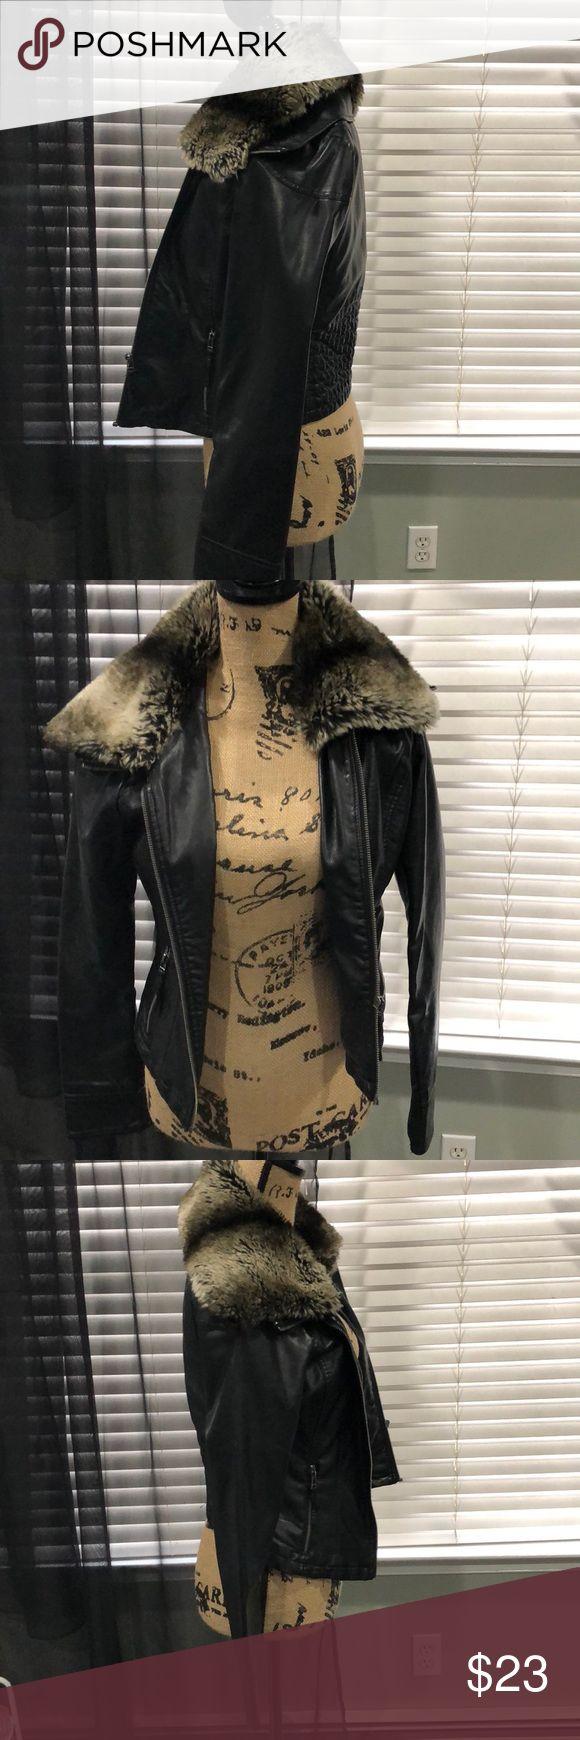 Black guess jacket Black jacket with fur Guess Jackets & Coats